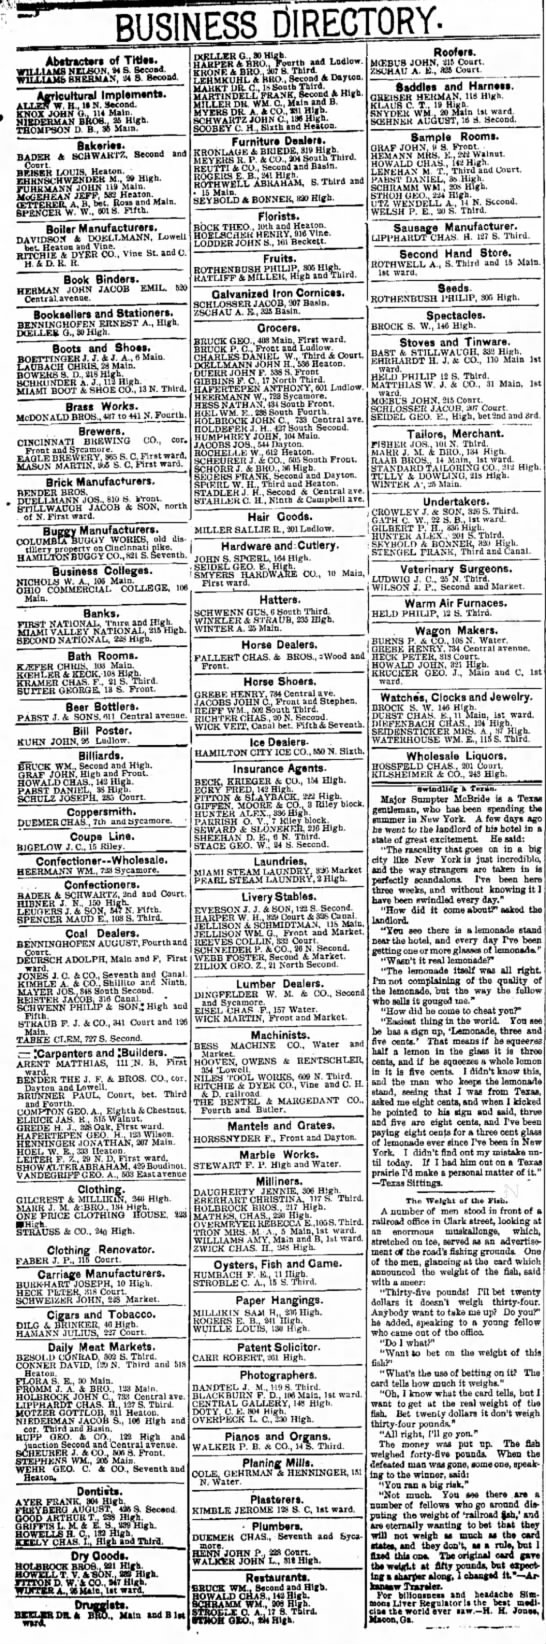 Hanilton 1891 Business Directory - BUSINESS DIRECTORY- Abstractor* of TWtt....